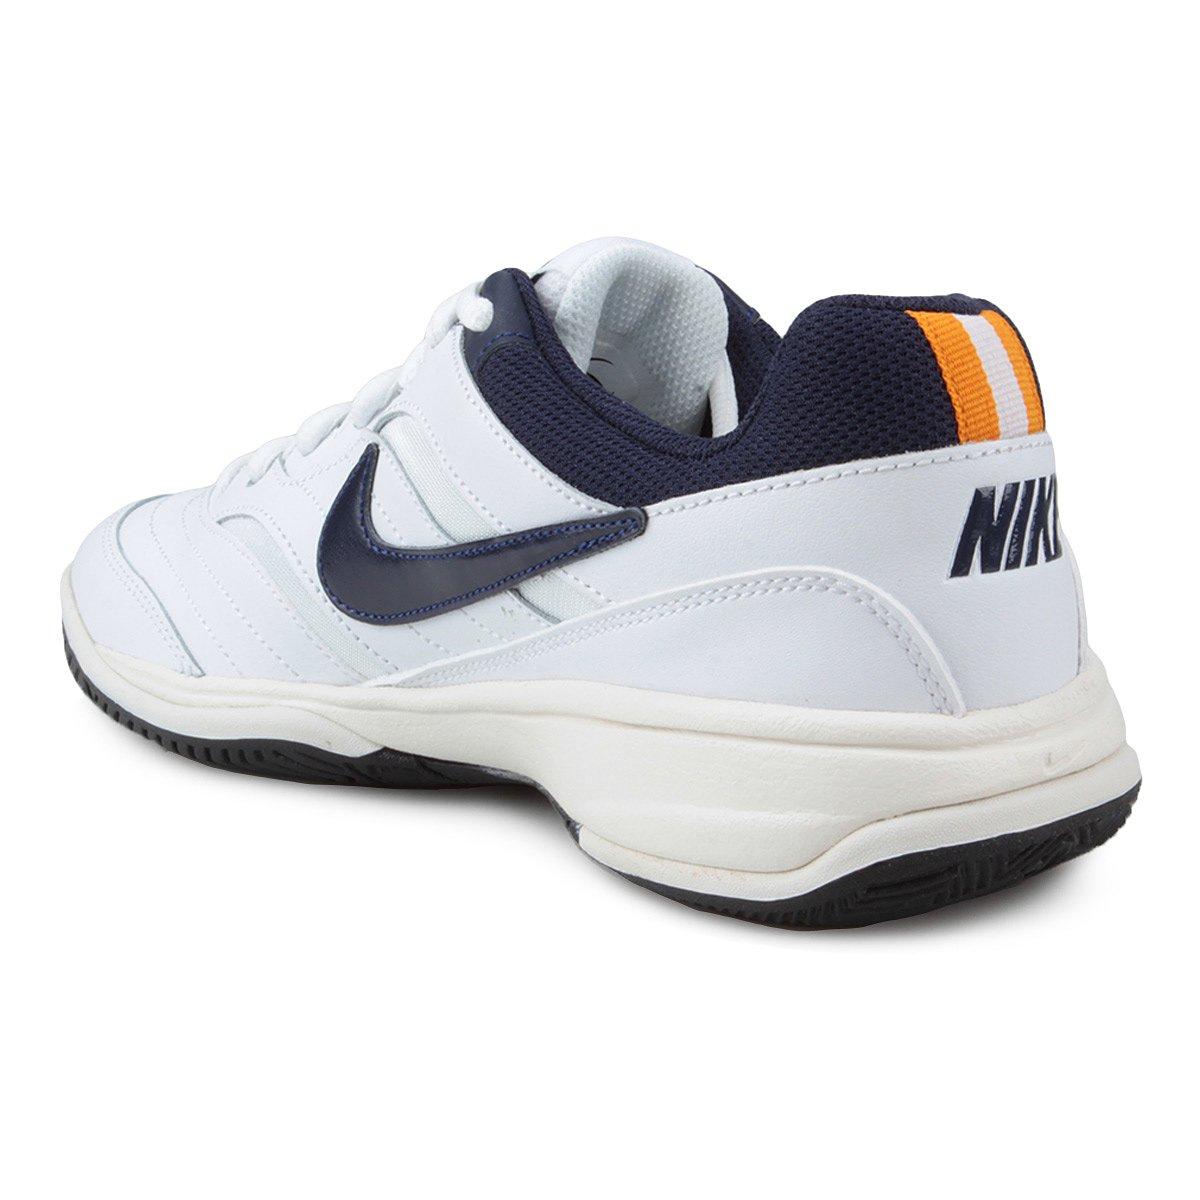 cd986c14e76 ... Foto 2 - Tênis Nike Court Lite Masculino